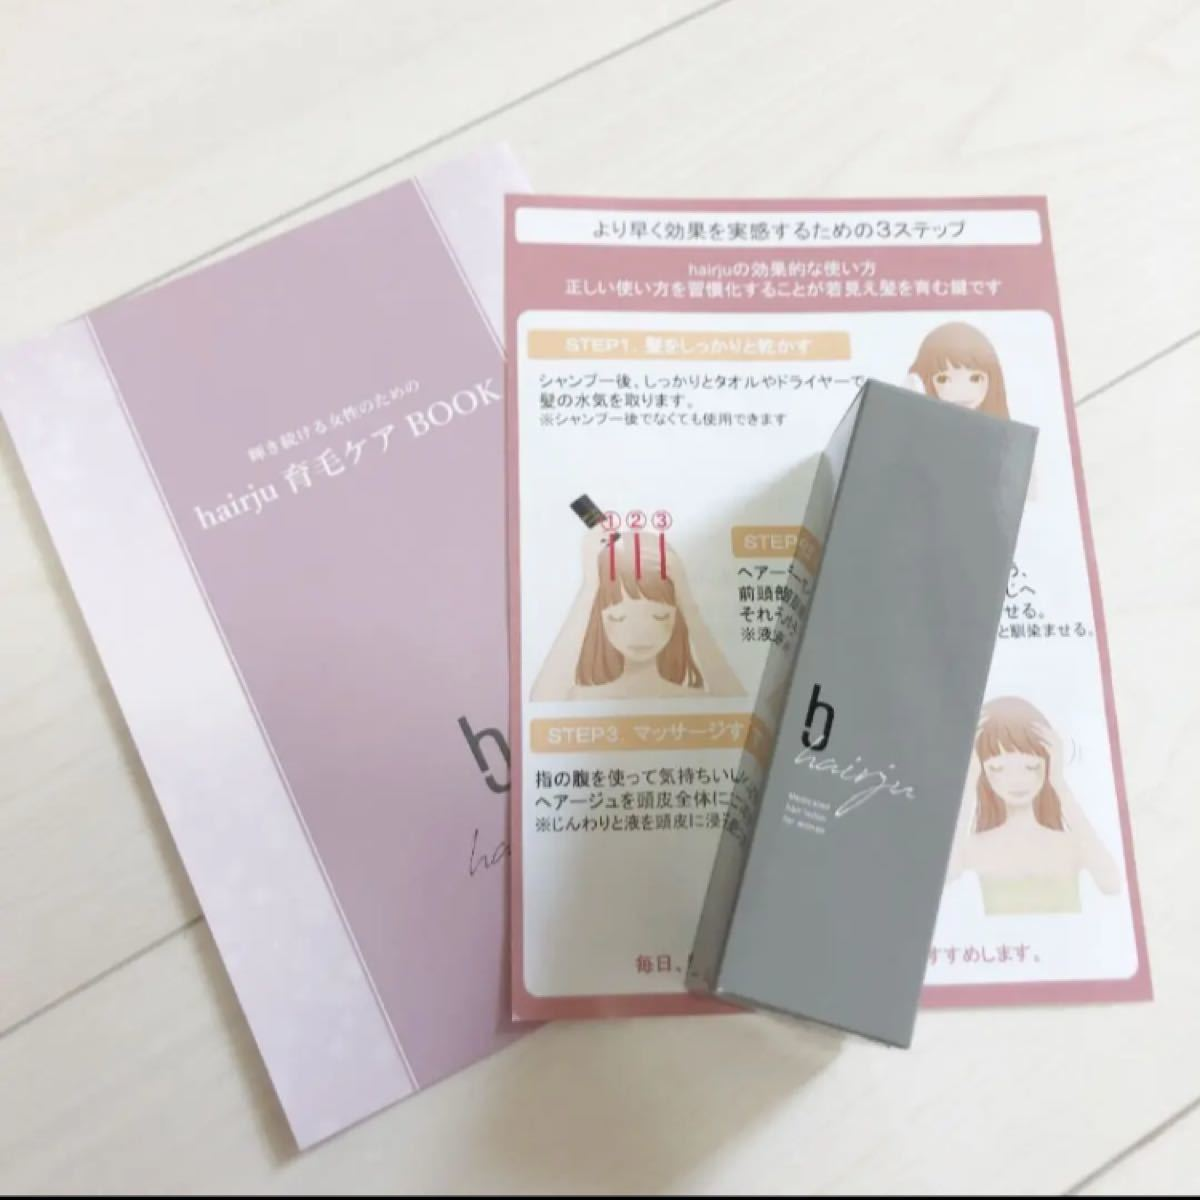 【hairju(ヘアージュ)】女性のための育毛剤